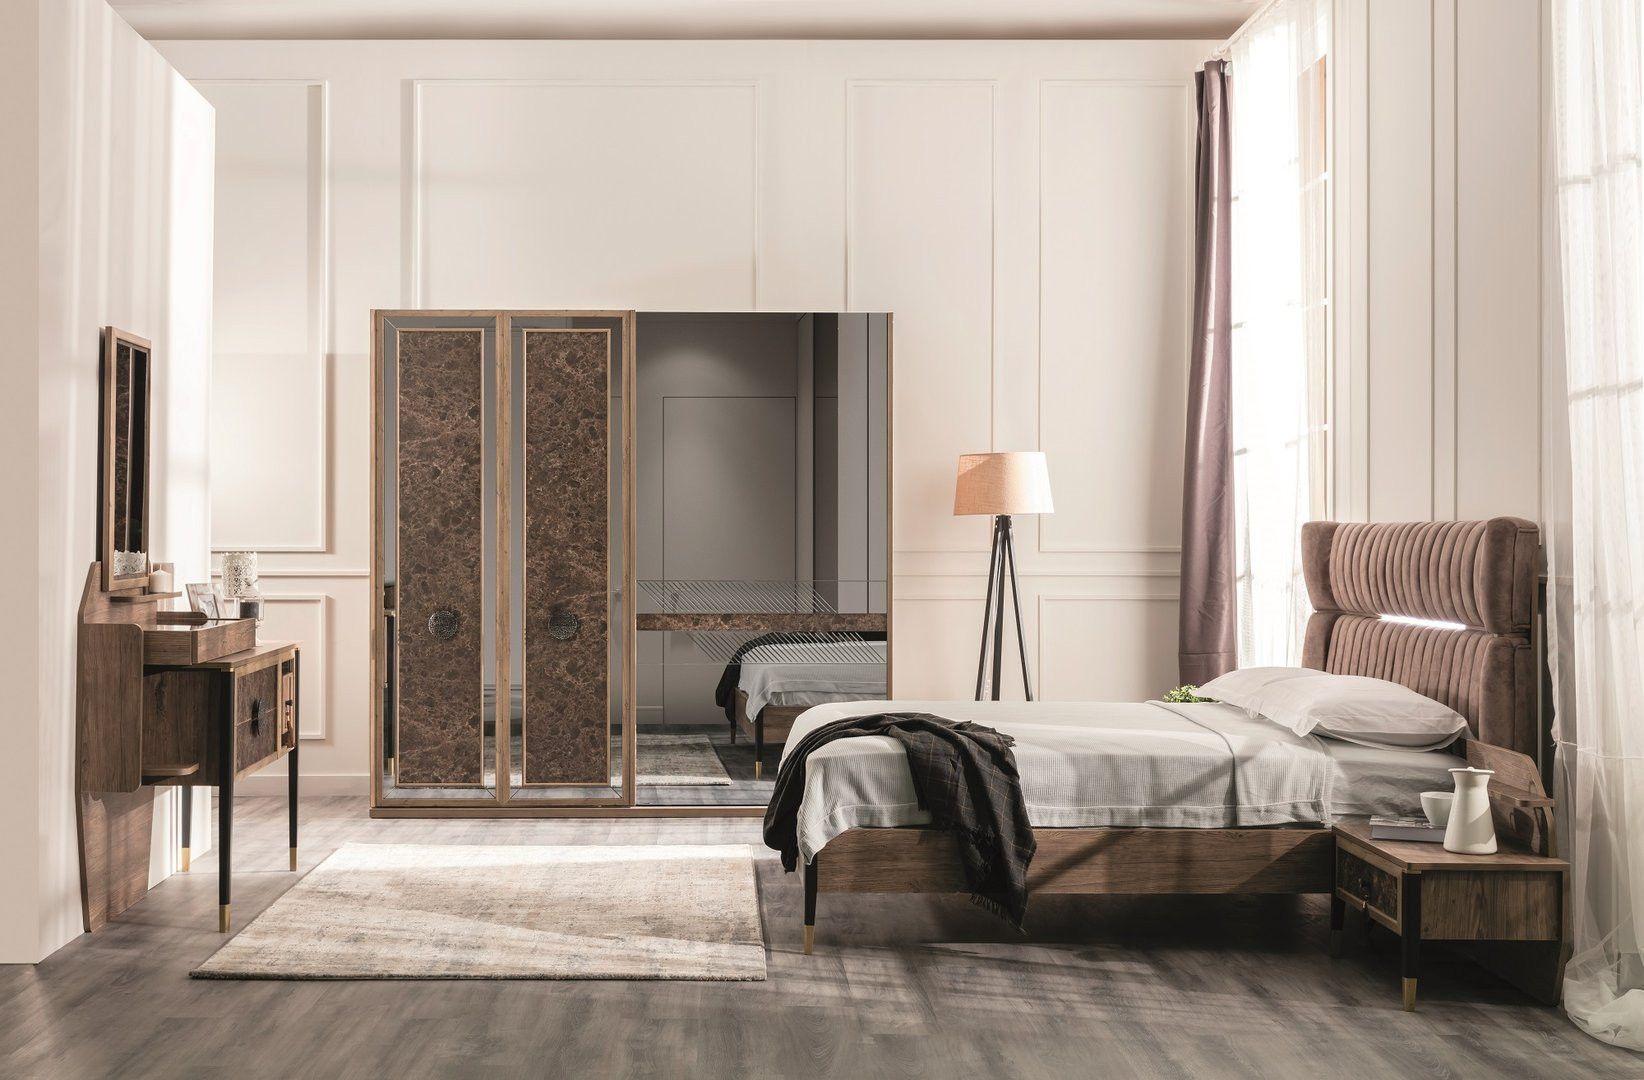 Schlafzimmer Komplett Set Elegant Schlafzimmer Komplett Set Wilma Mobelland24 Di 2020